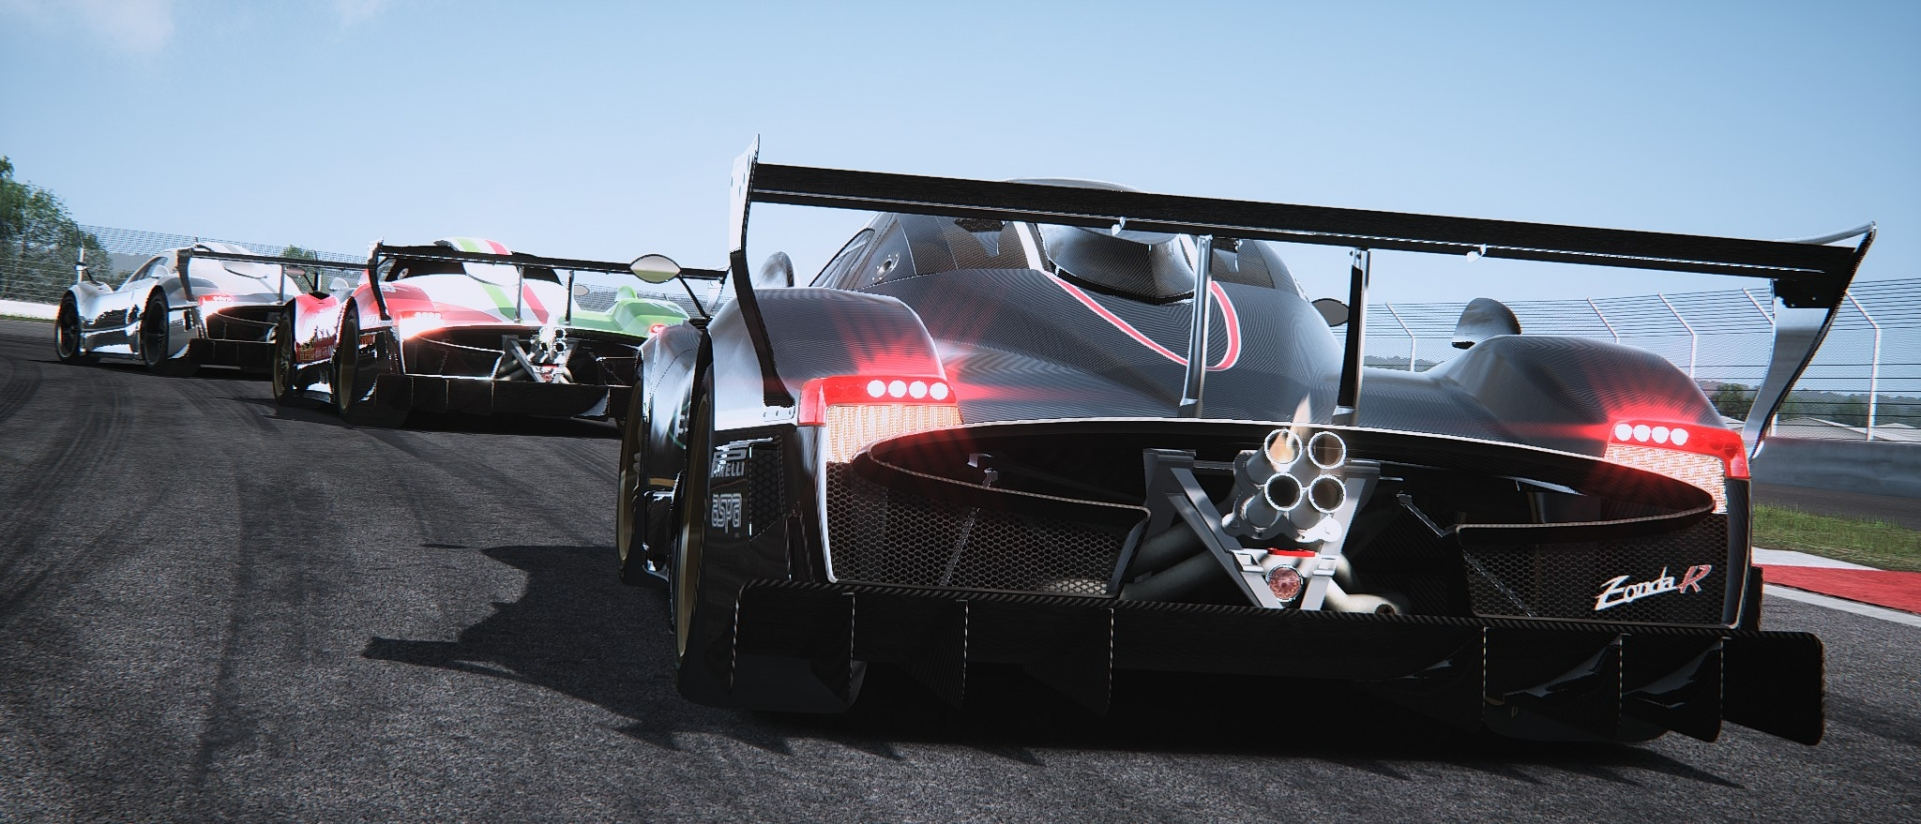 Assetto Corsa - Pagani Zonda Silverstone 07